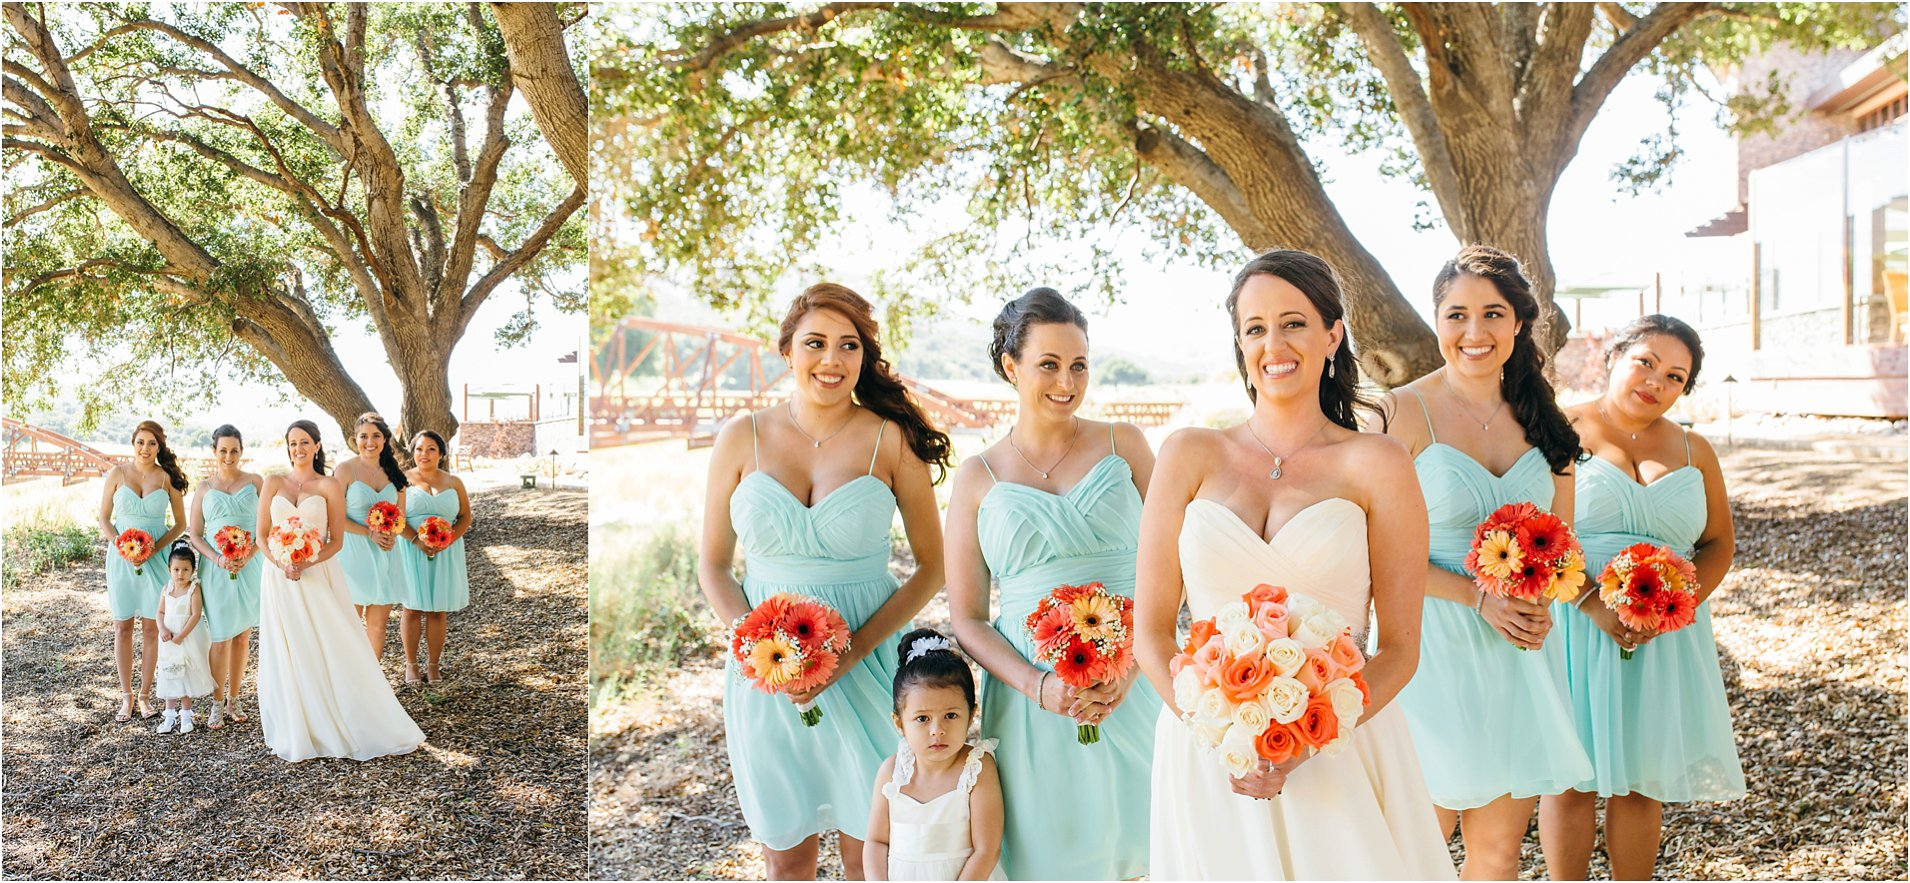 bride and bridesmaids photos in southern california